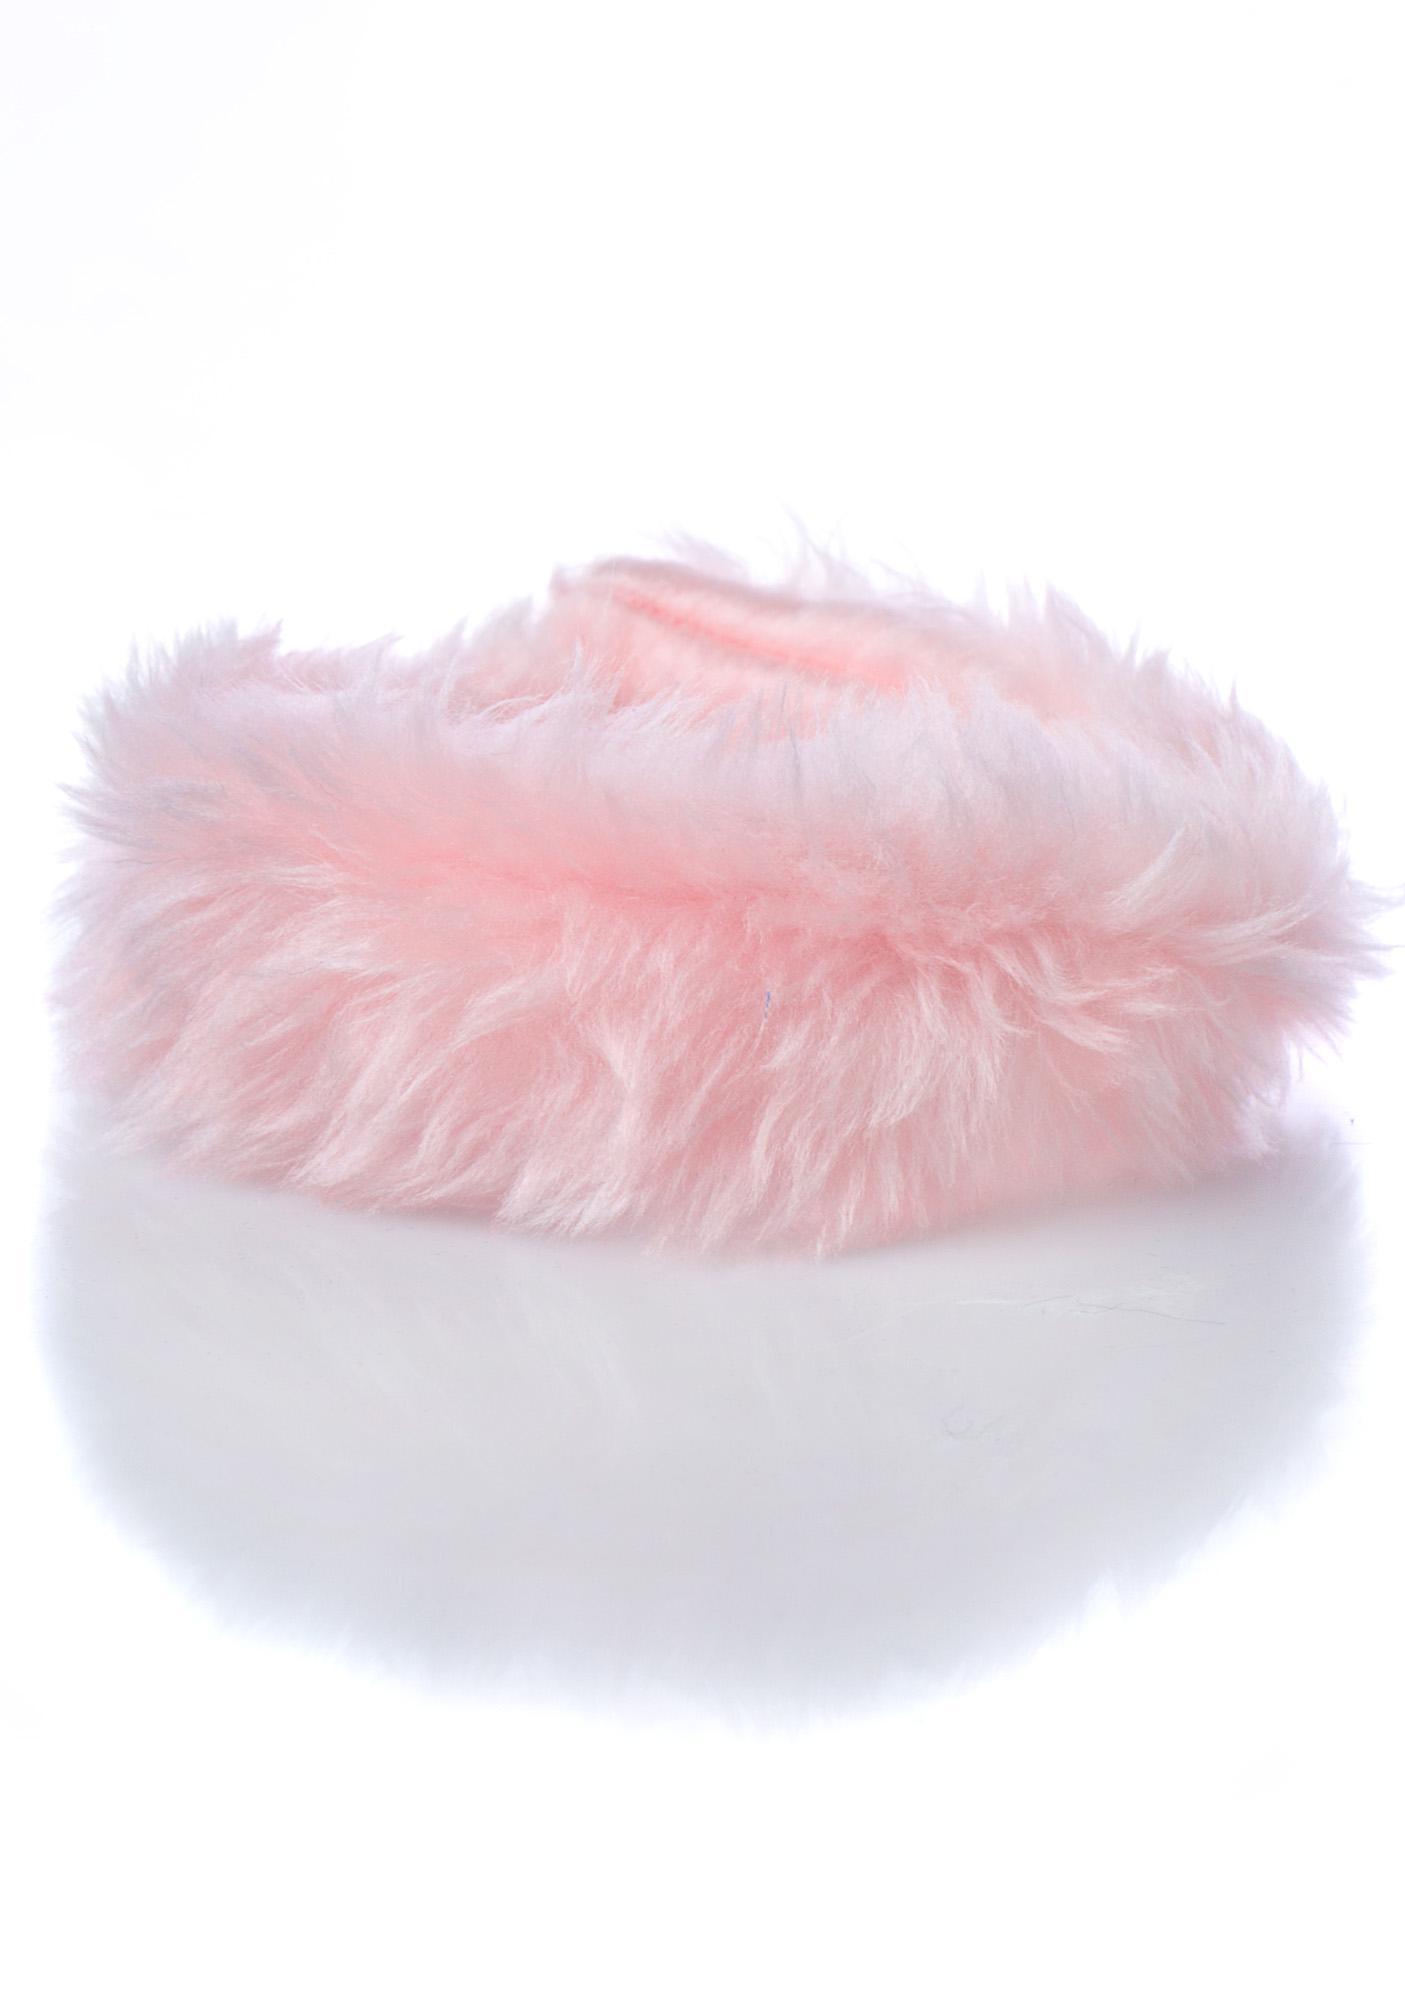 Pht Furry Sweet Luv Fuzzy Choker